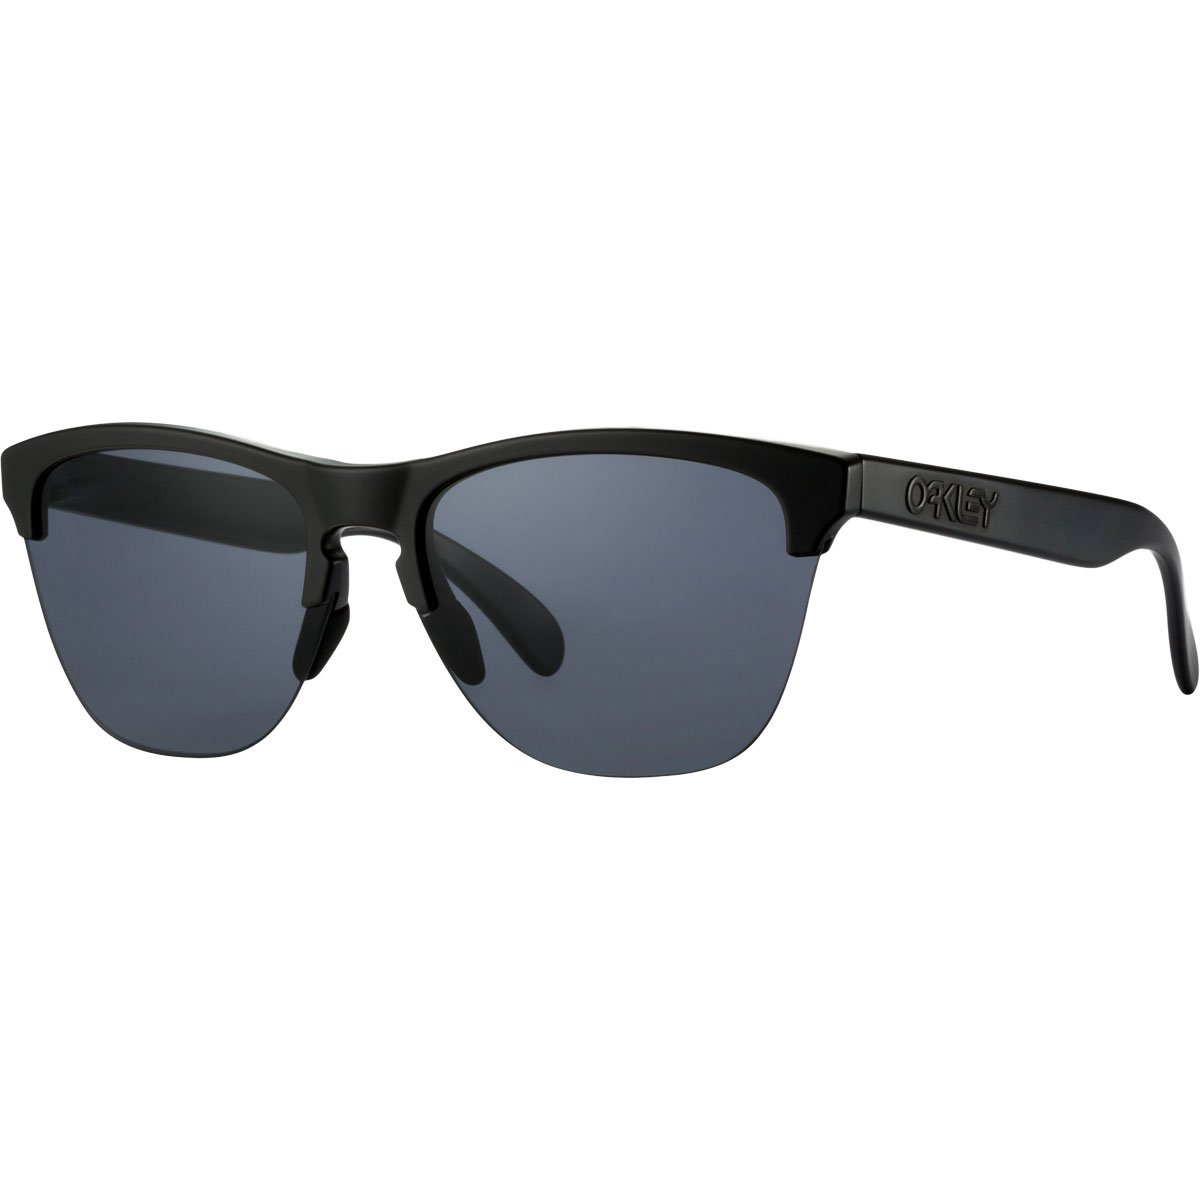 Oakley Frogskins Lite Sunglasses, Matte Black/Gray,OS